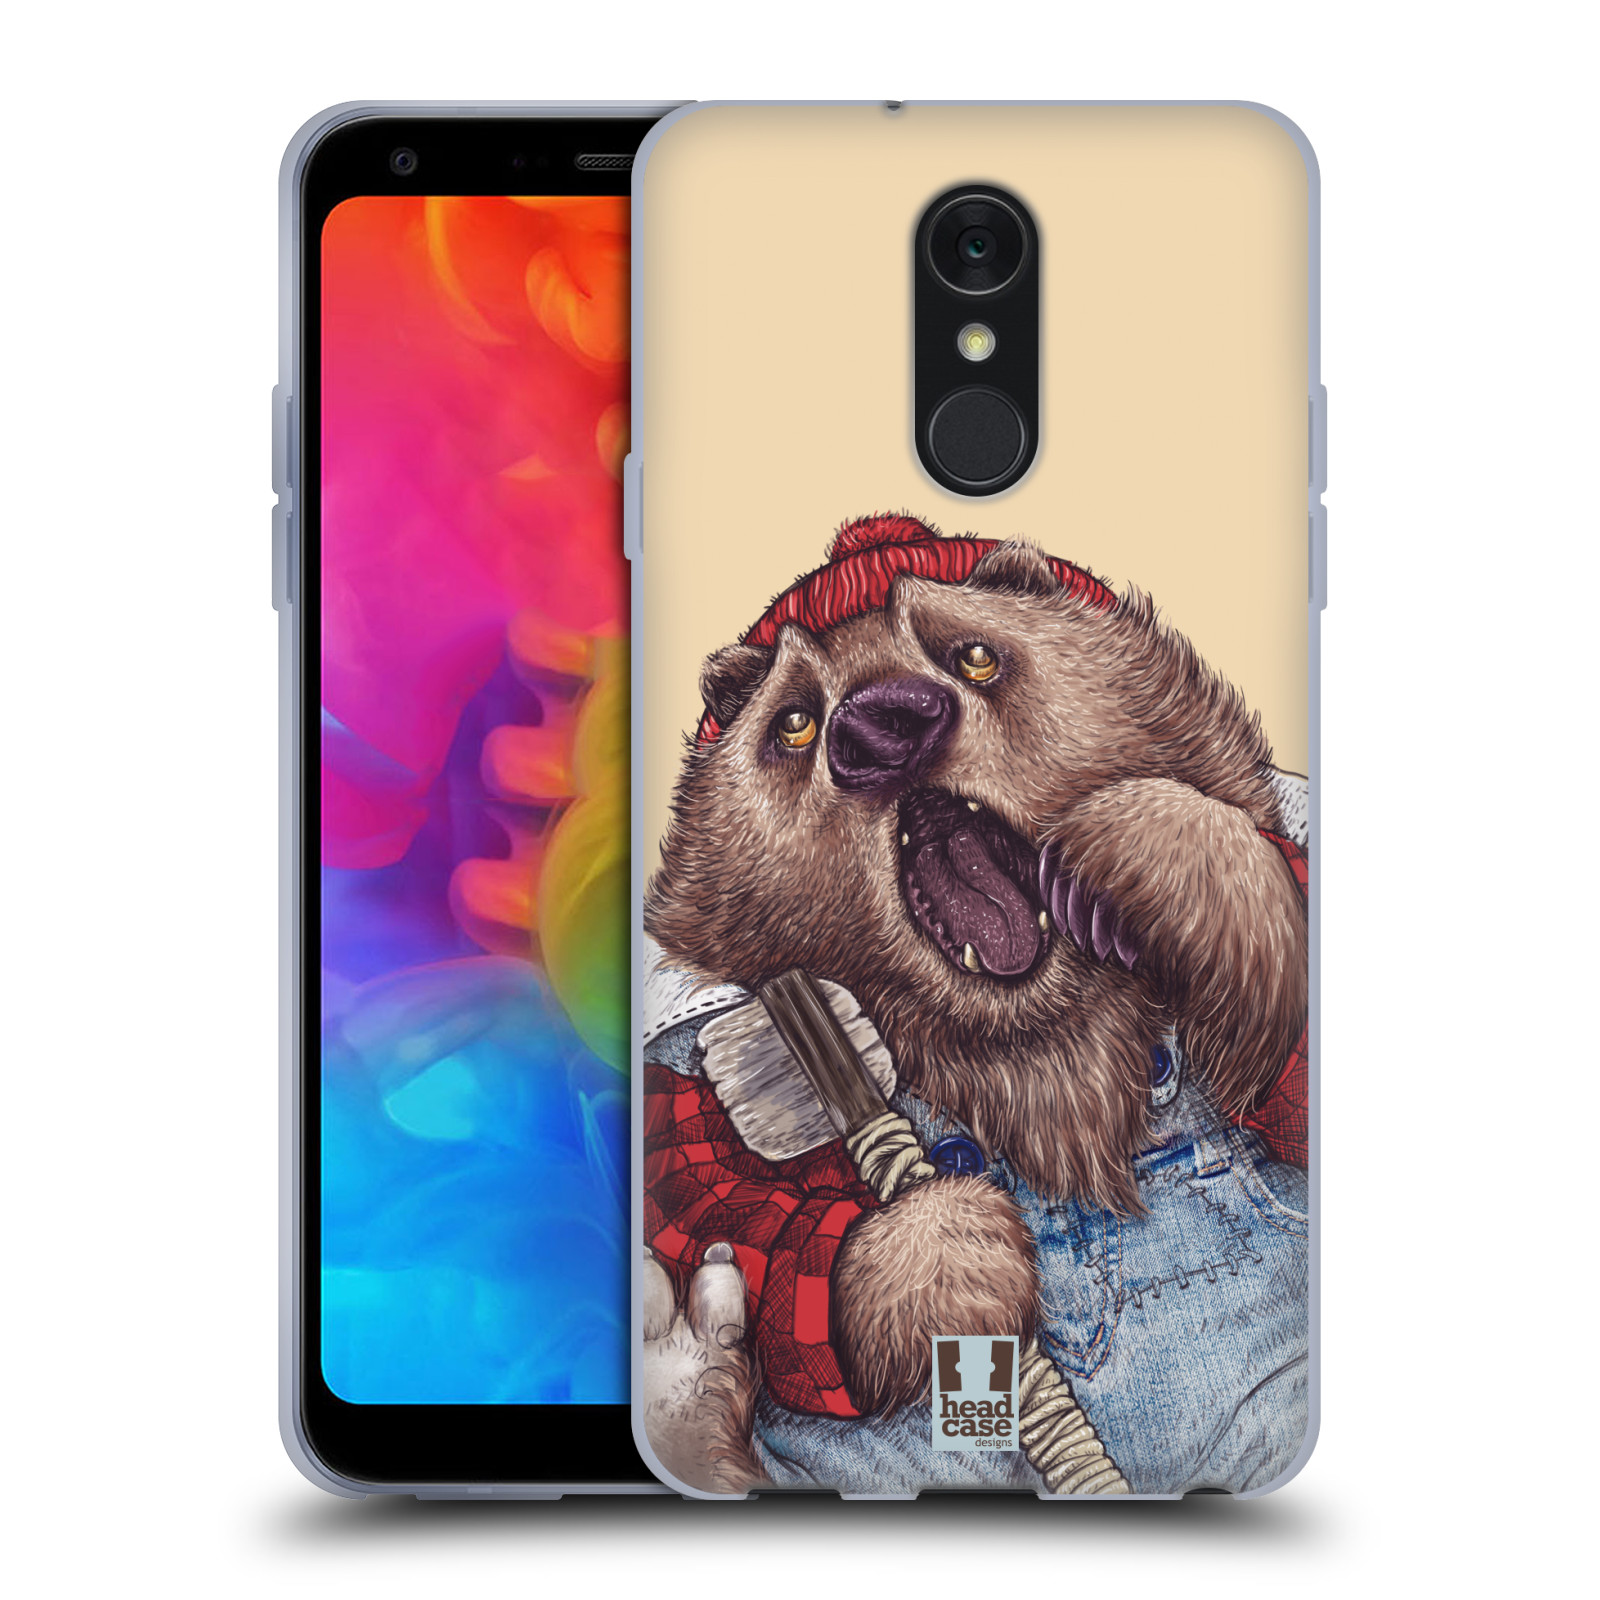 Silikonové pouzdro na mobil LG Q7 - Head Case - ANIMPLA MEDVĚD